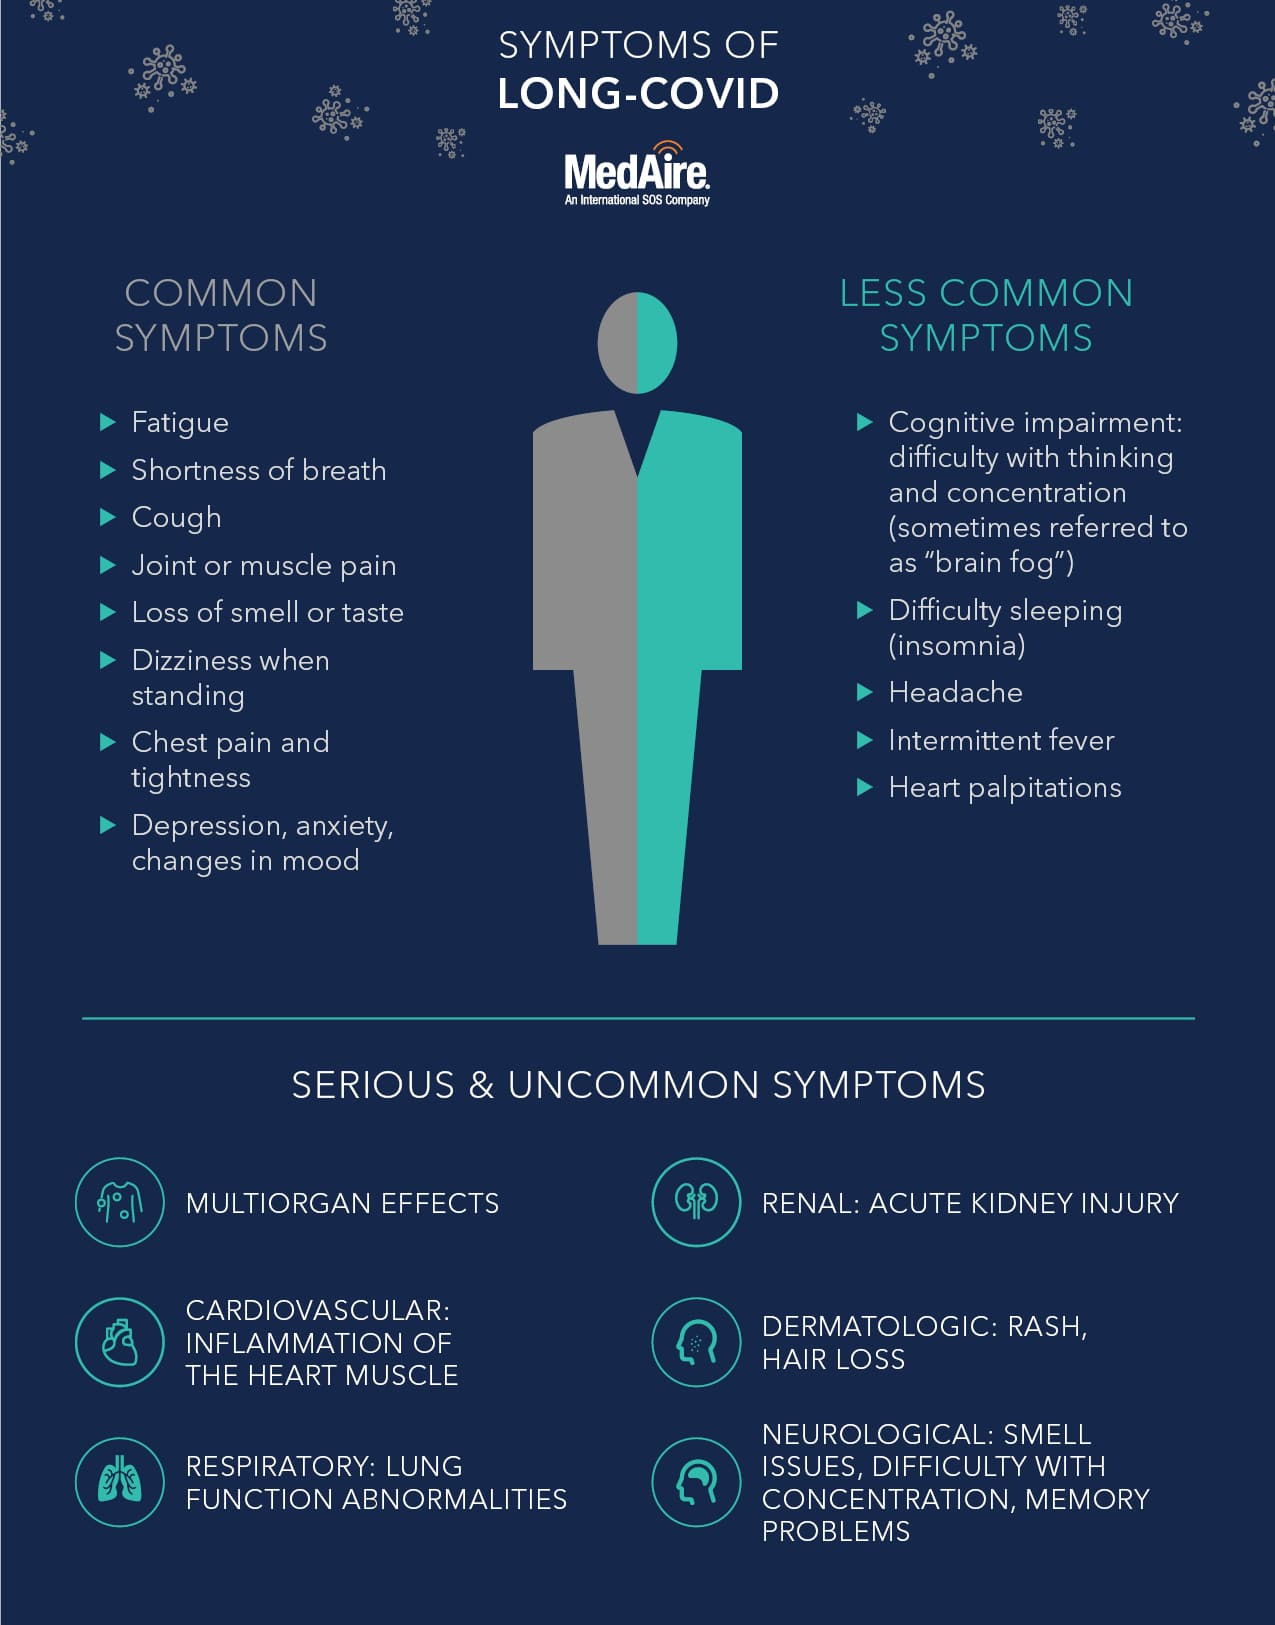 SYMPTOMS OF LONG-COVID